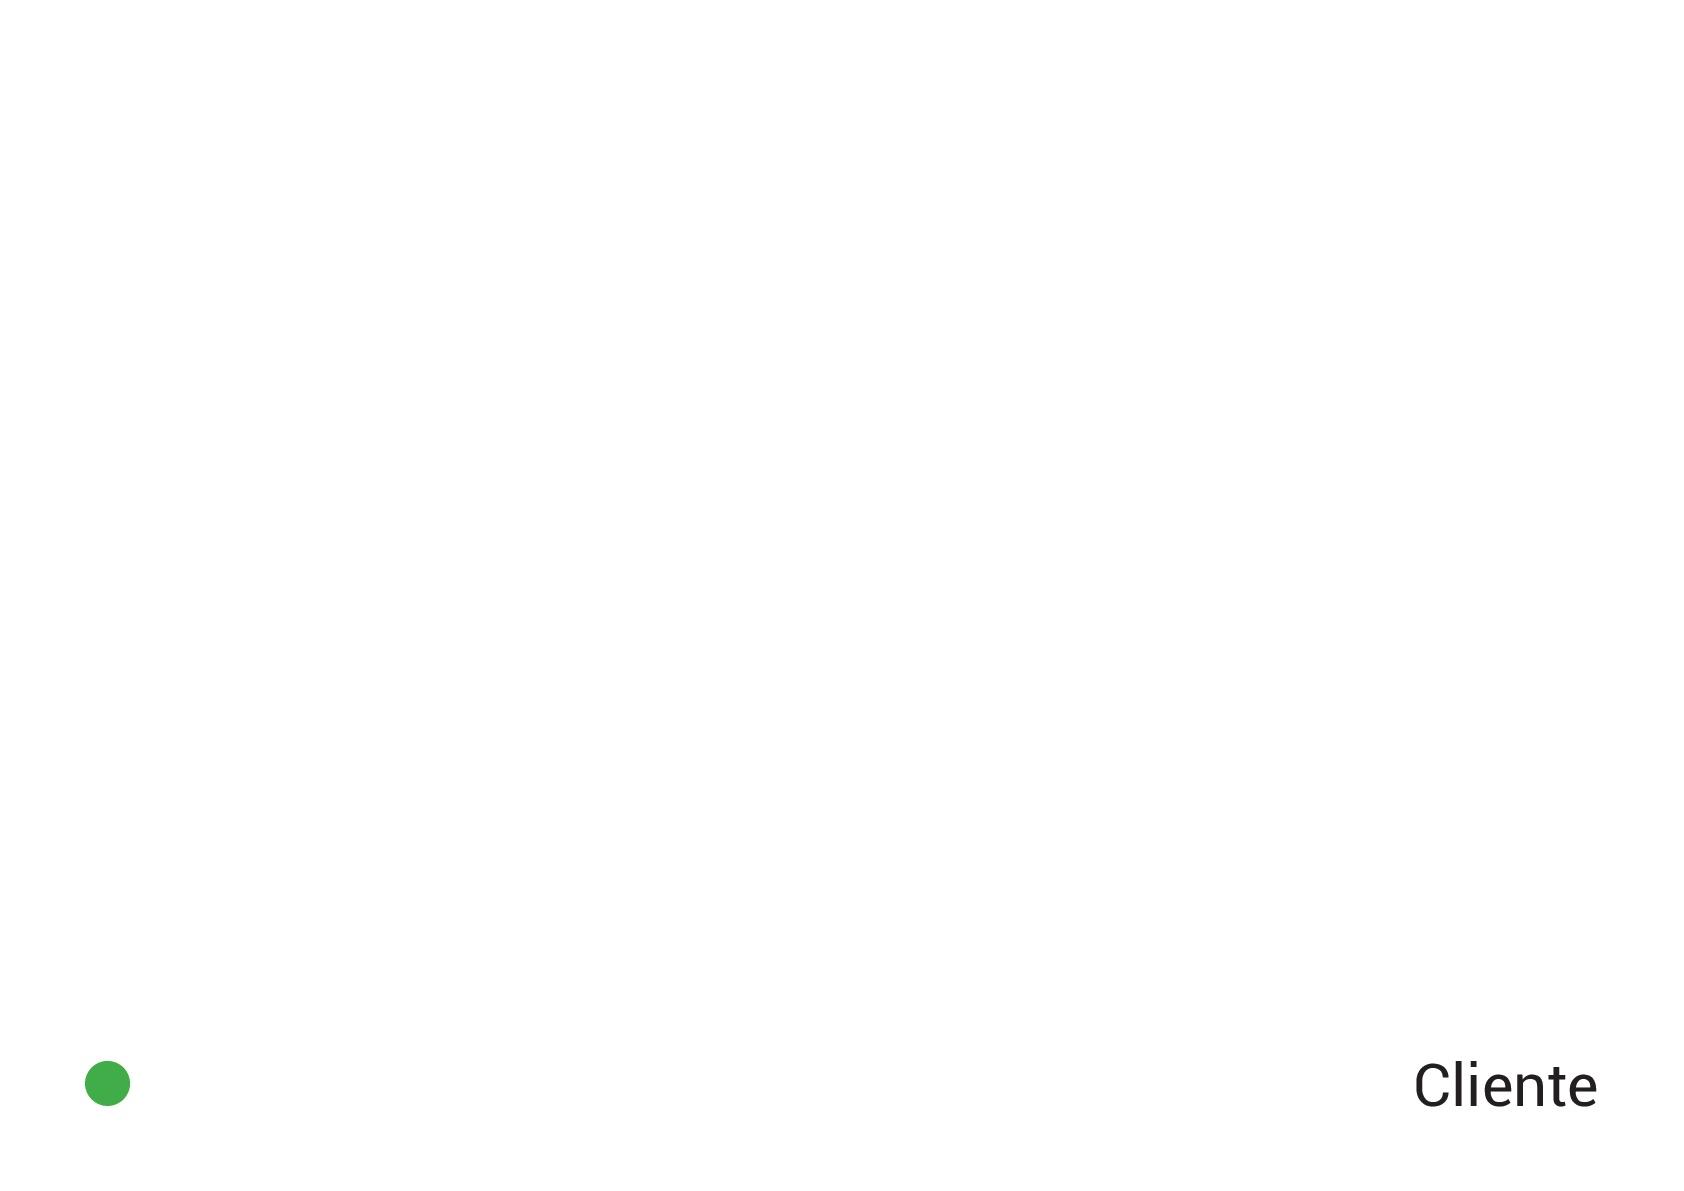 PLAN-MARKETING-ONLINE-MARMOLES-FRAN-005